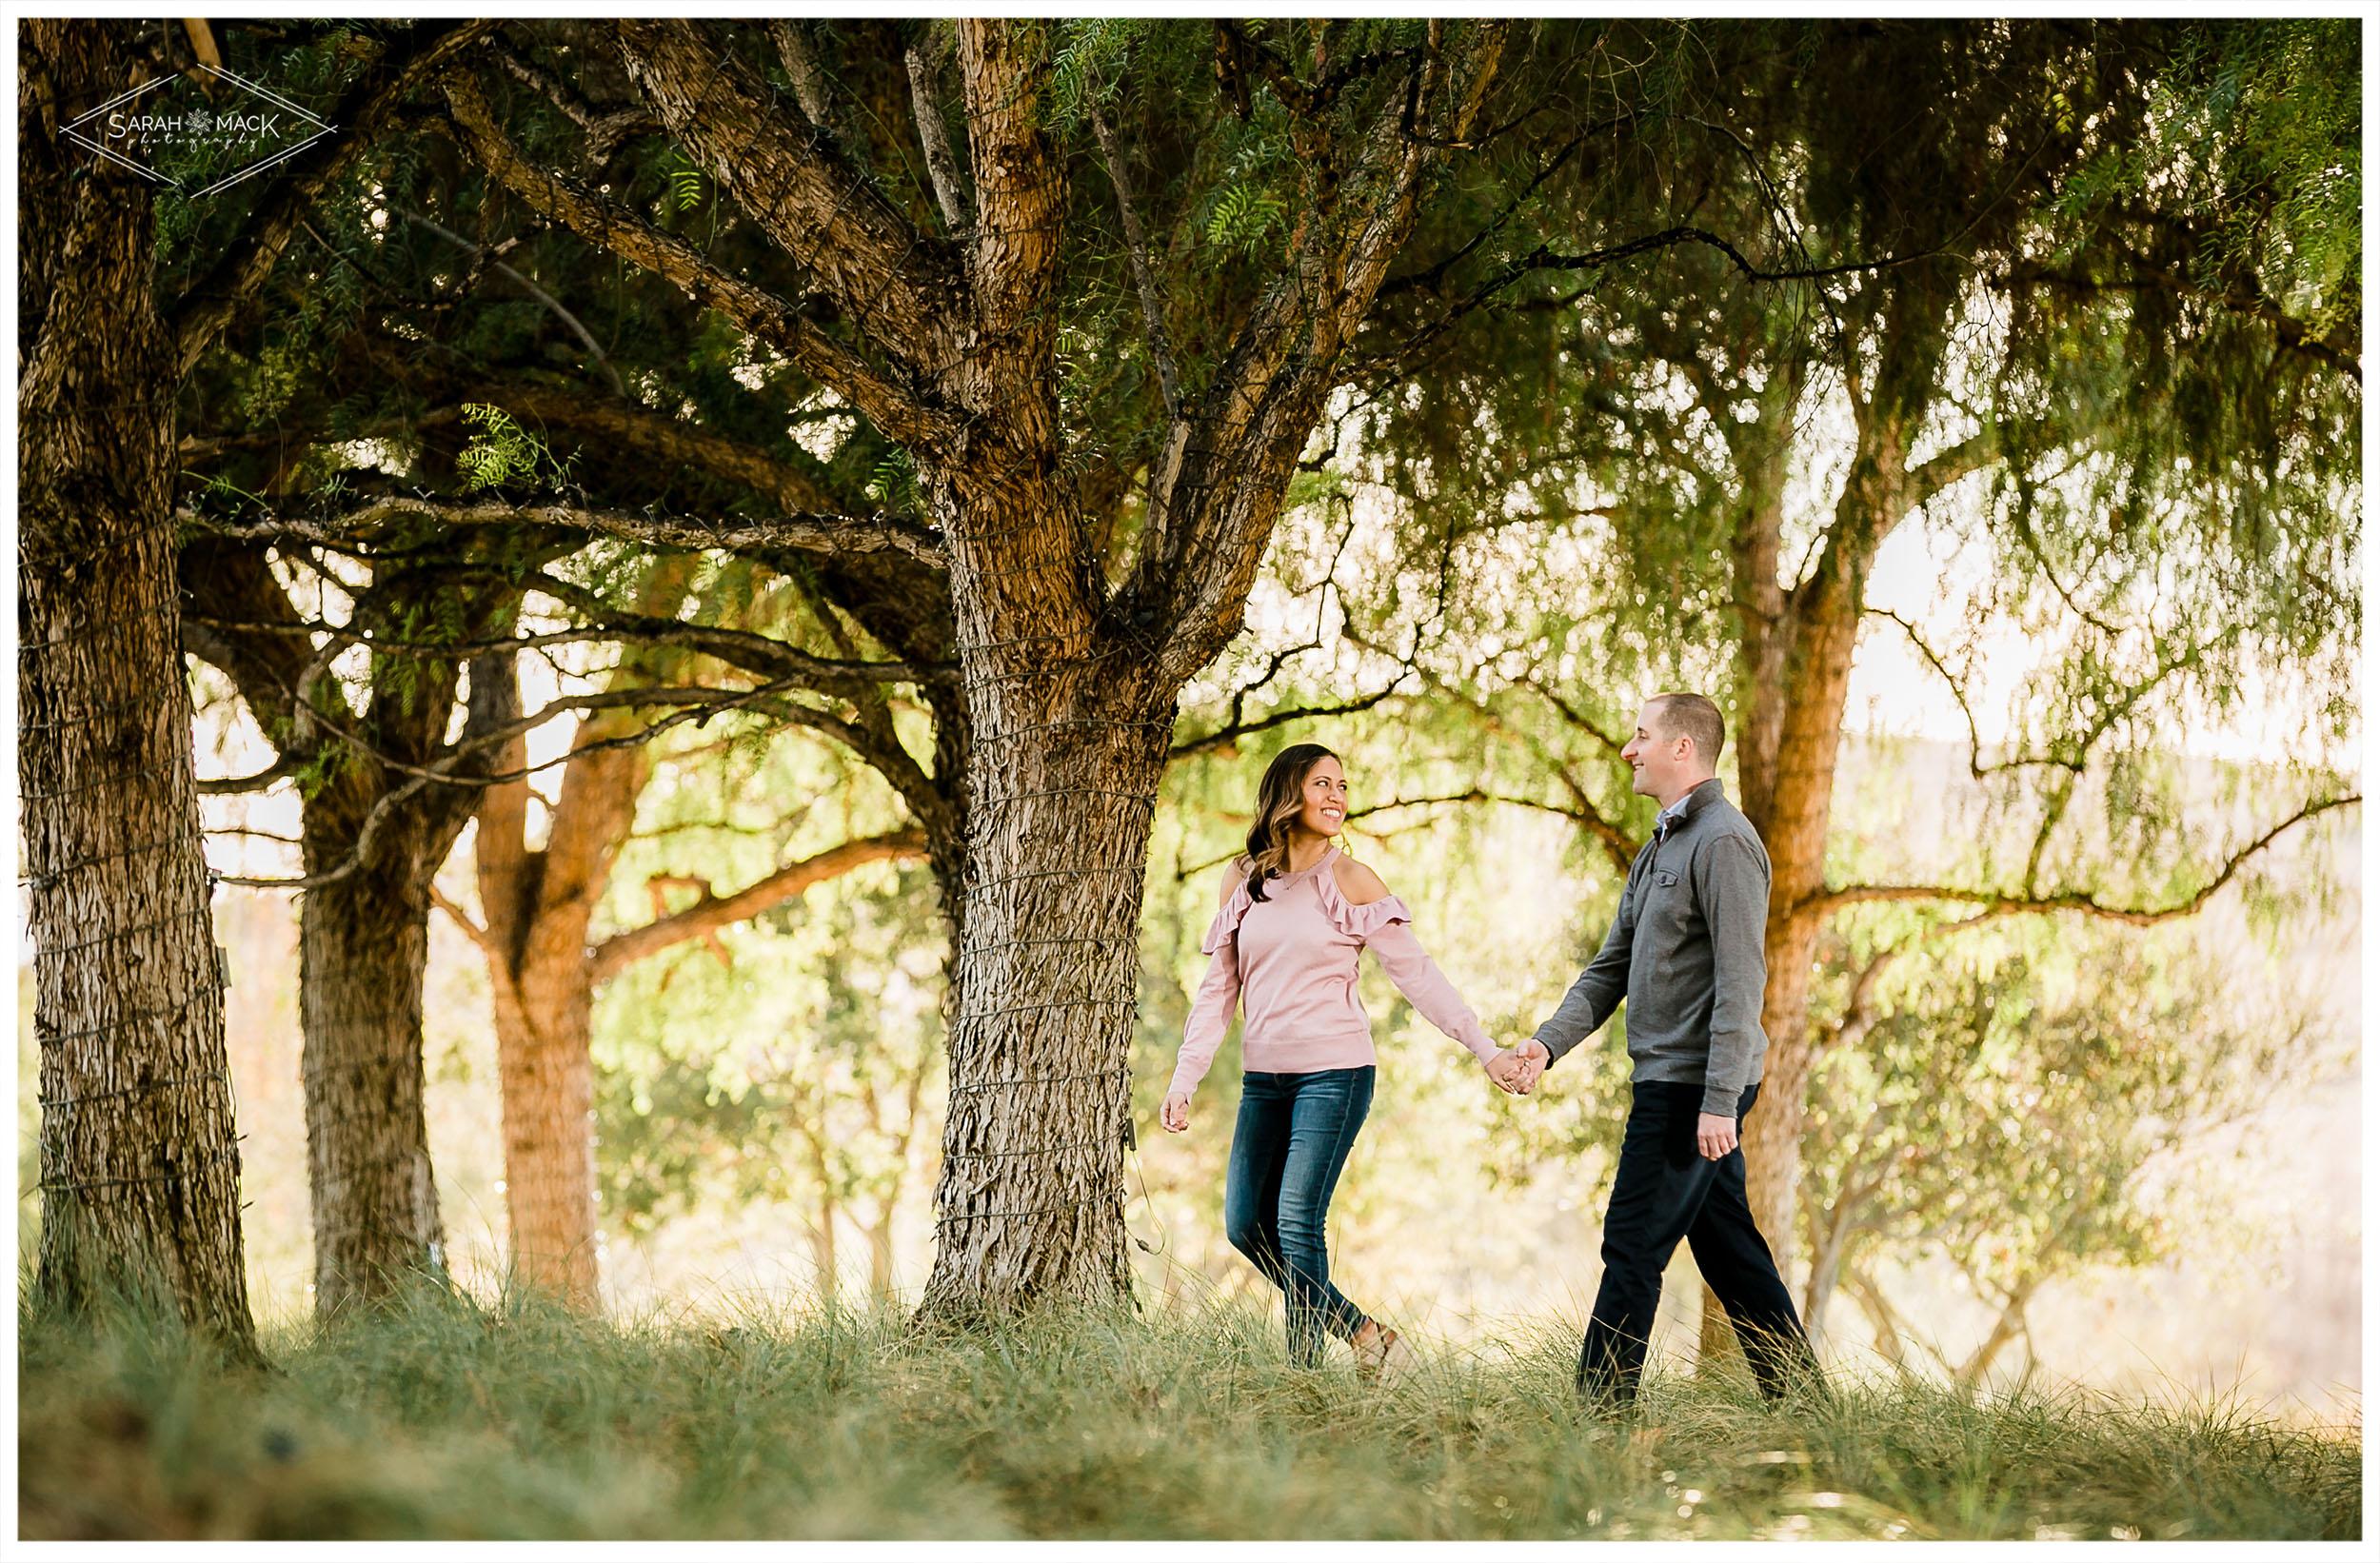 MR-Orange-County-Engagement-5.jpg